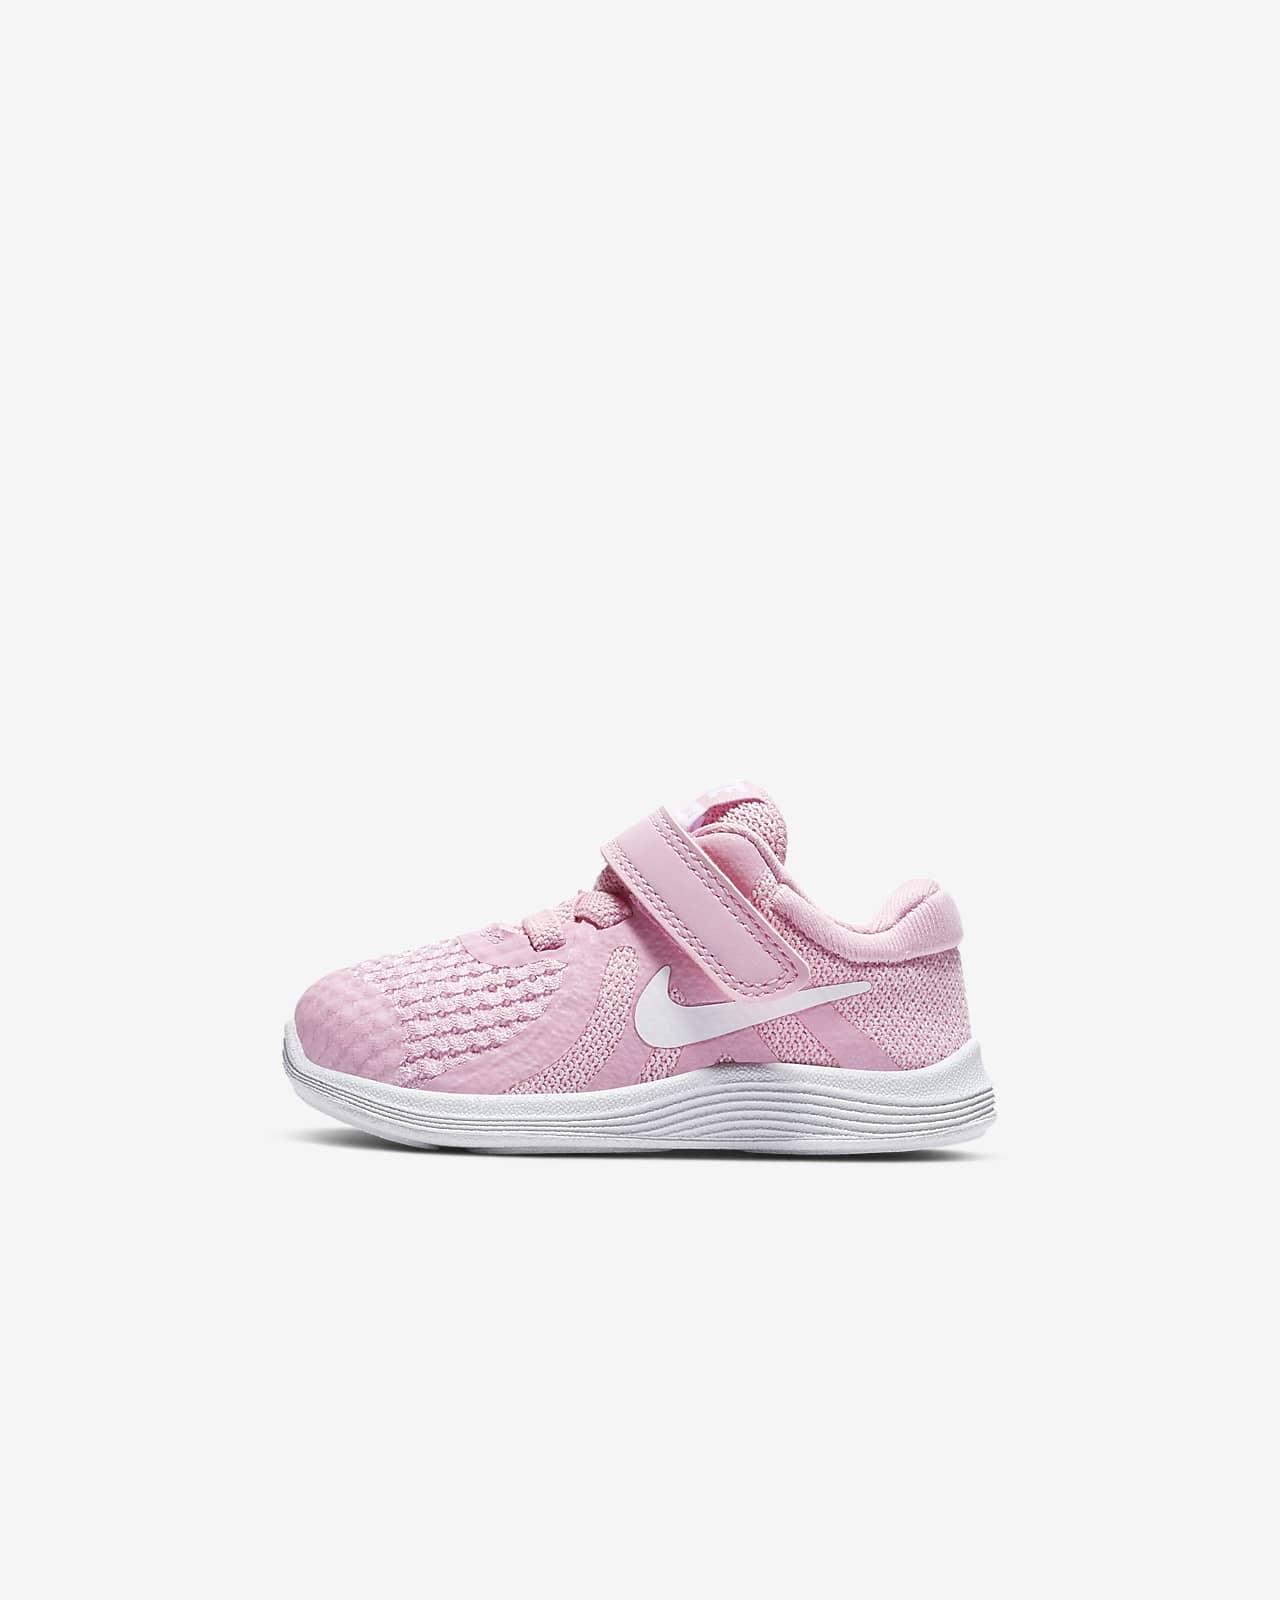 Scarpa Nike Revolution 4 - Neonati/Bimbi piccoli